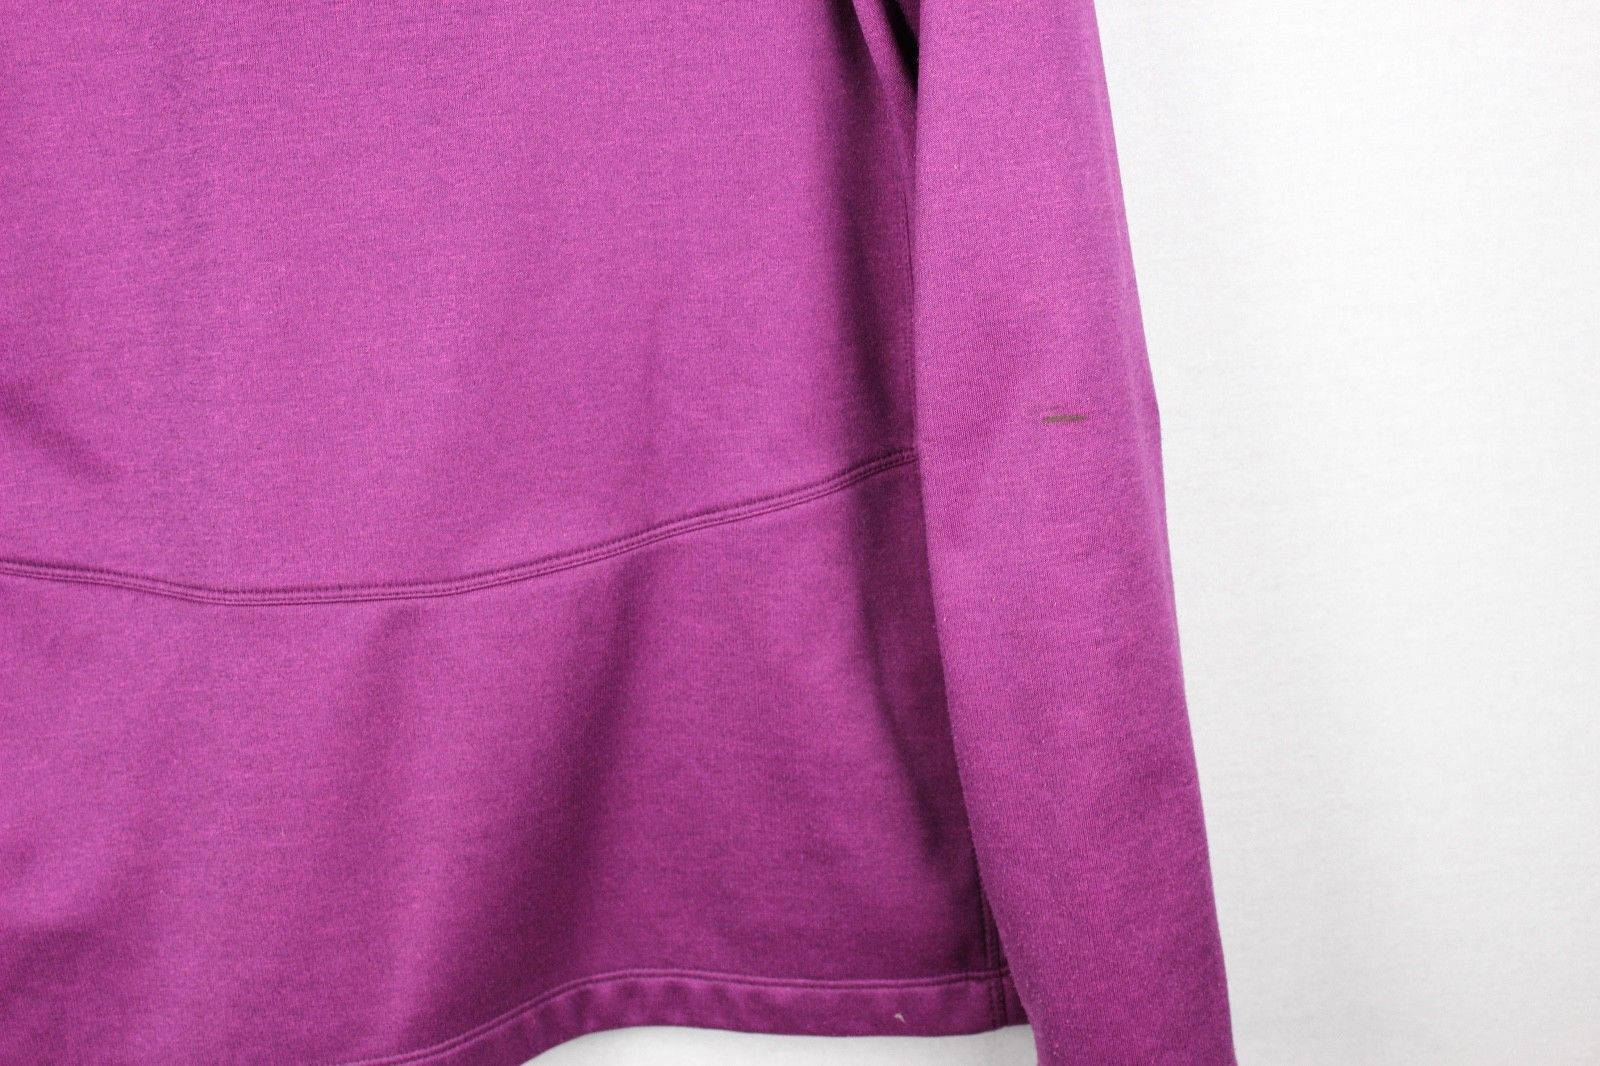 The North Face women's sweatshirt hoodie full zipper burgundy size L/G